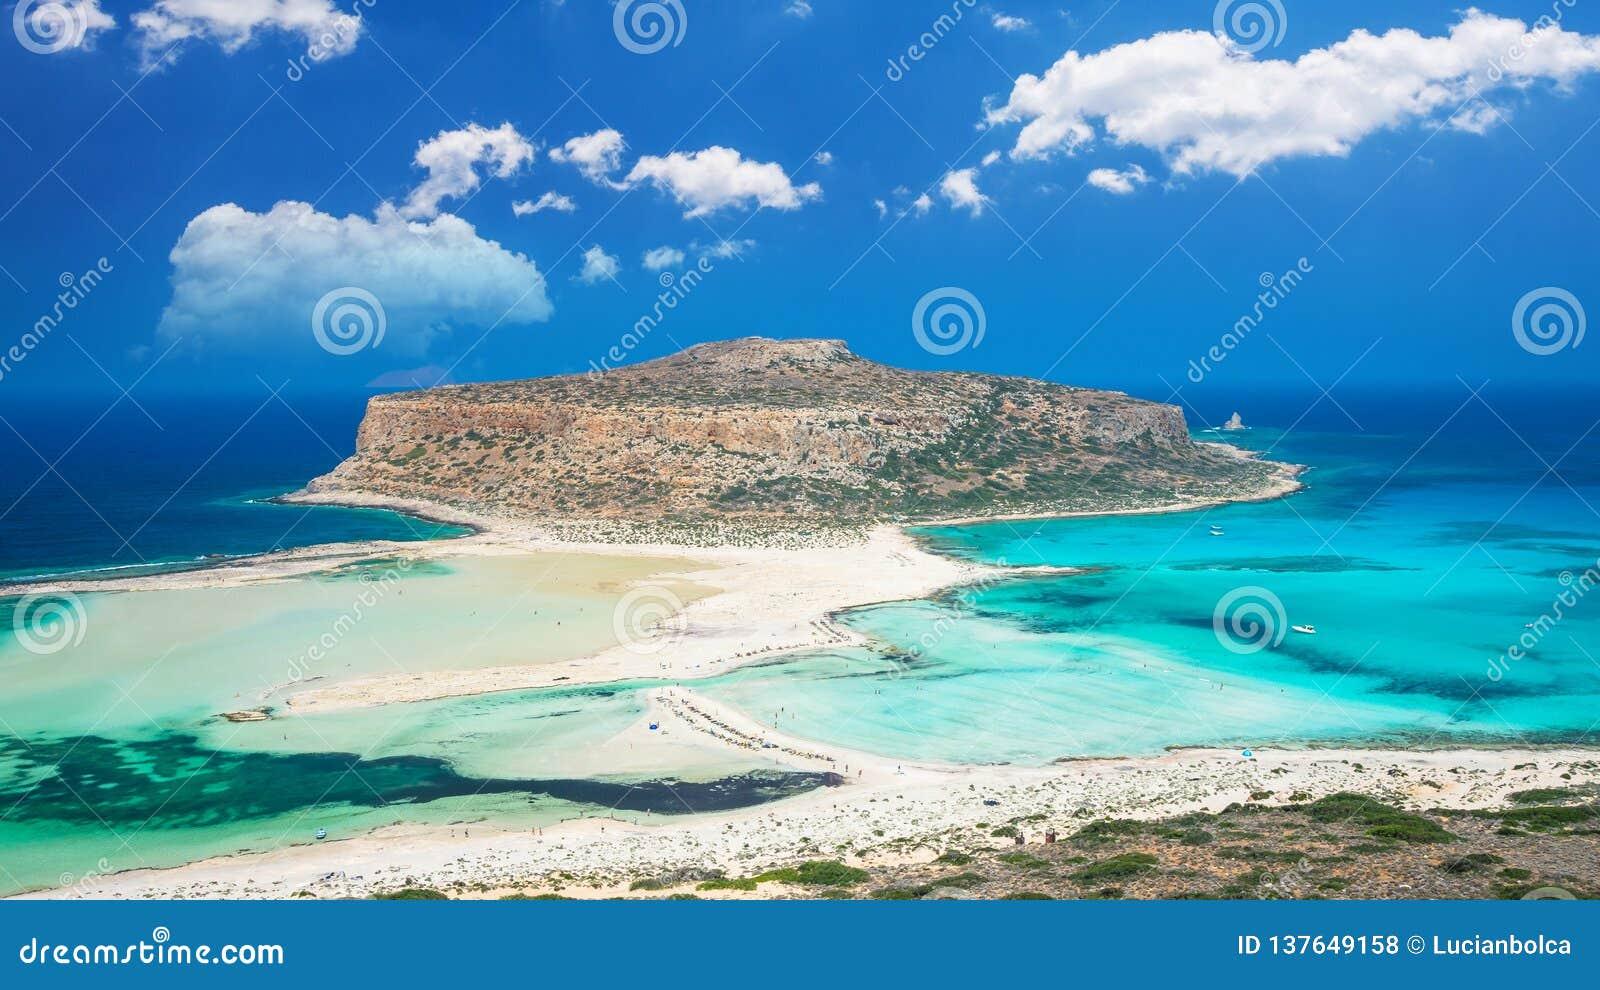 Balos Lagoon On Crete Island Greece Stock Photo Image Of